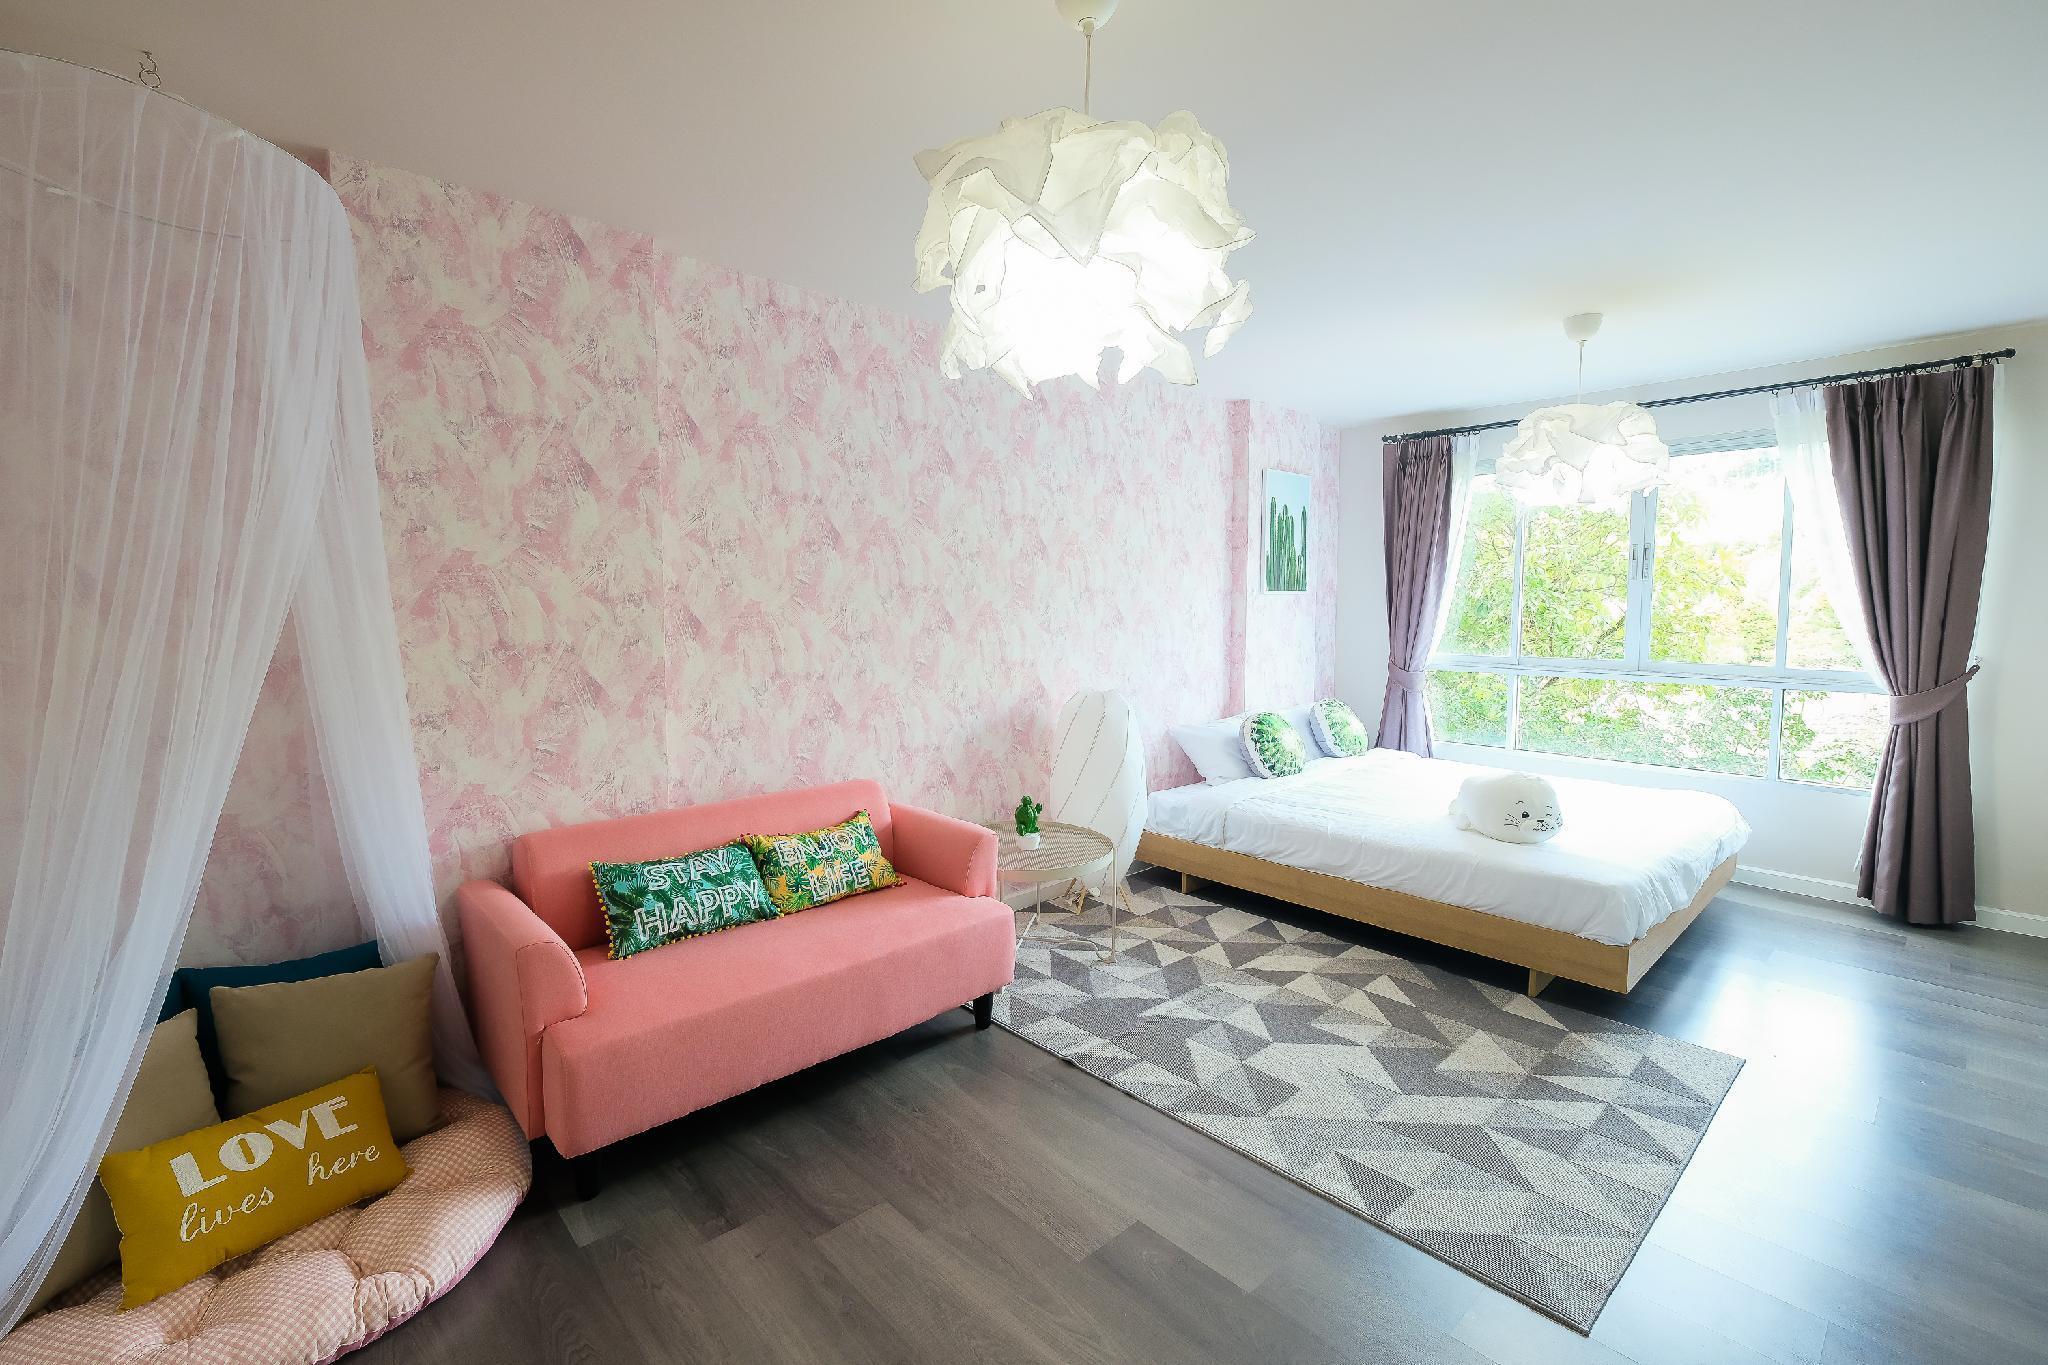 Palm leaf & Pastel pink condo in Phuket town +WIFI อพาร์ตเมนต์ 1 ห้องนอน 1 ห้องน้ำส่วนตัว ขนาด 30 ตร.ม. – ตัวเมืองภูเก็ต